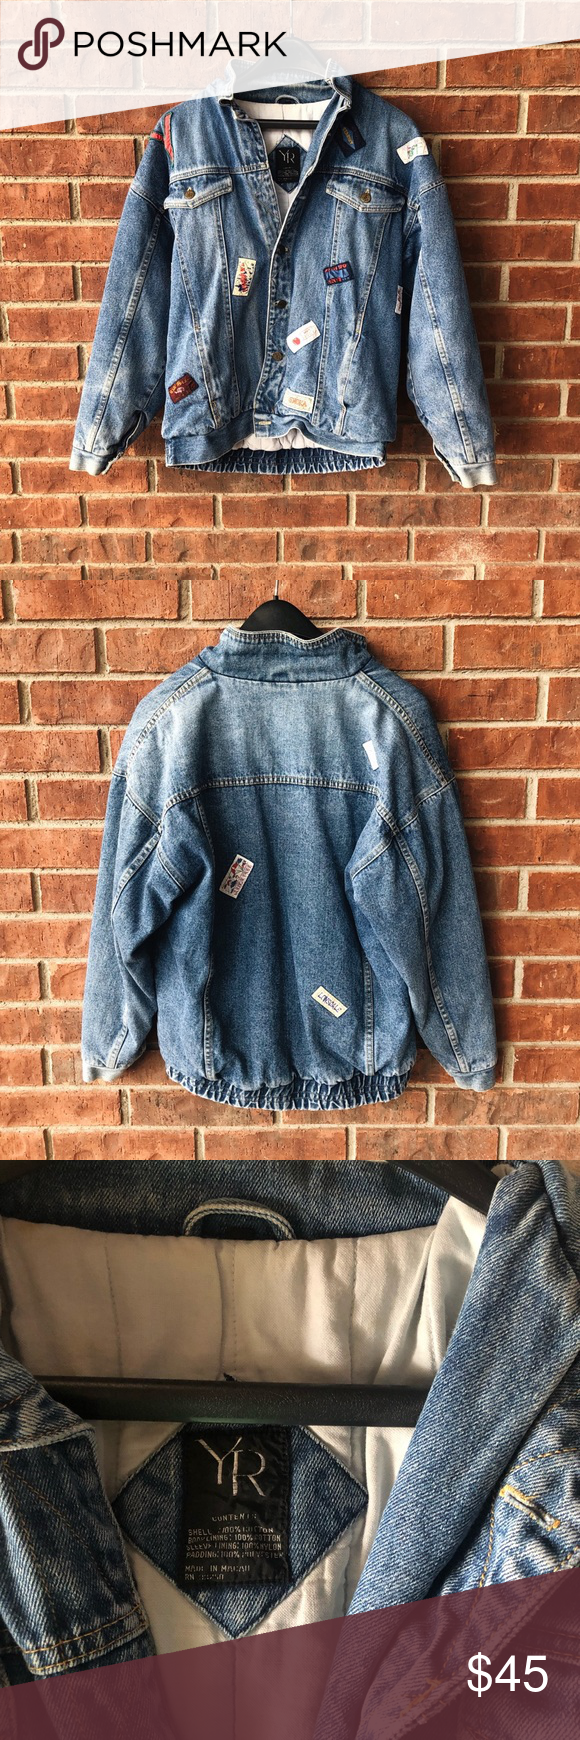 yr vintage jean jacket